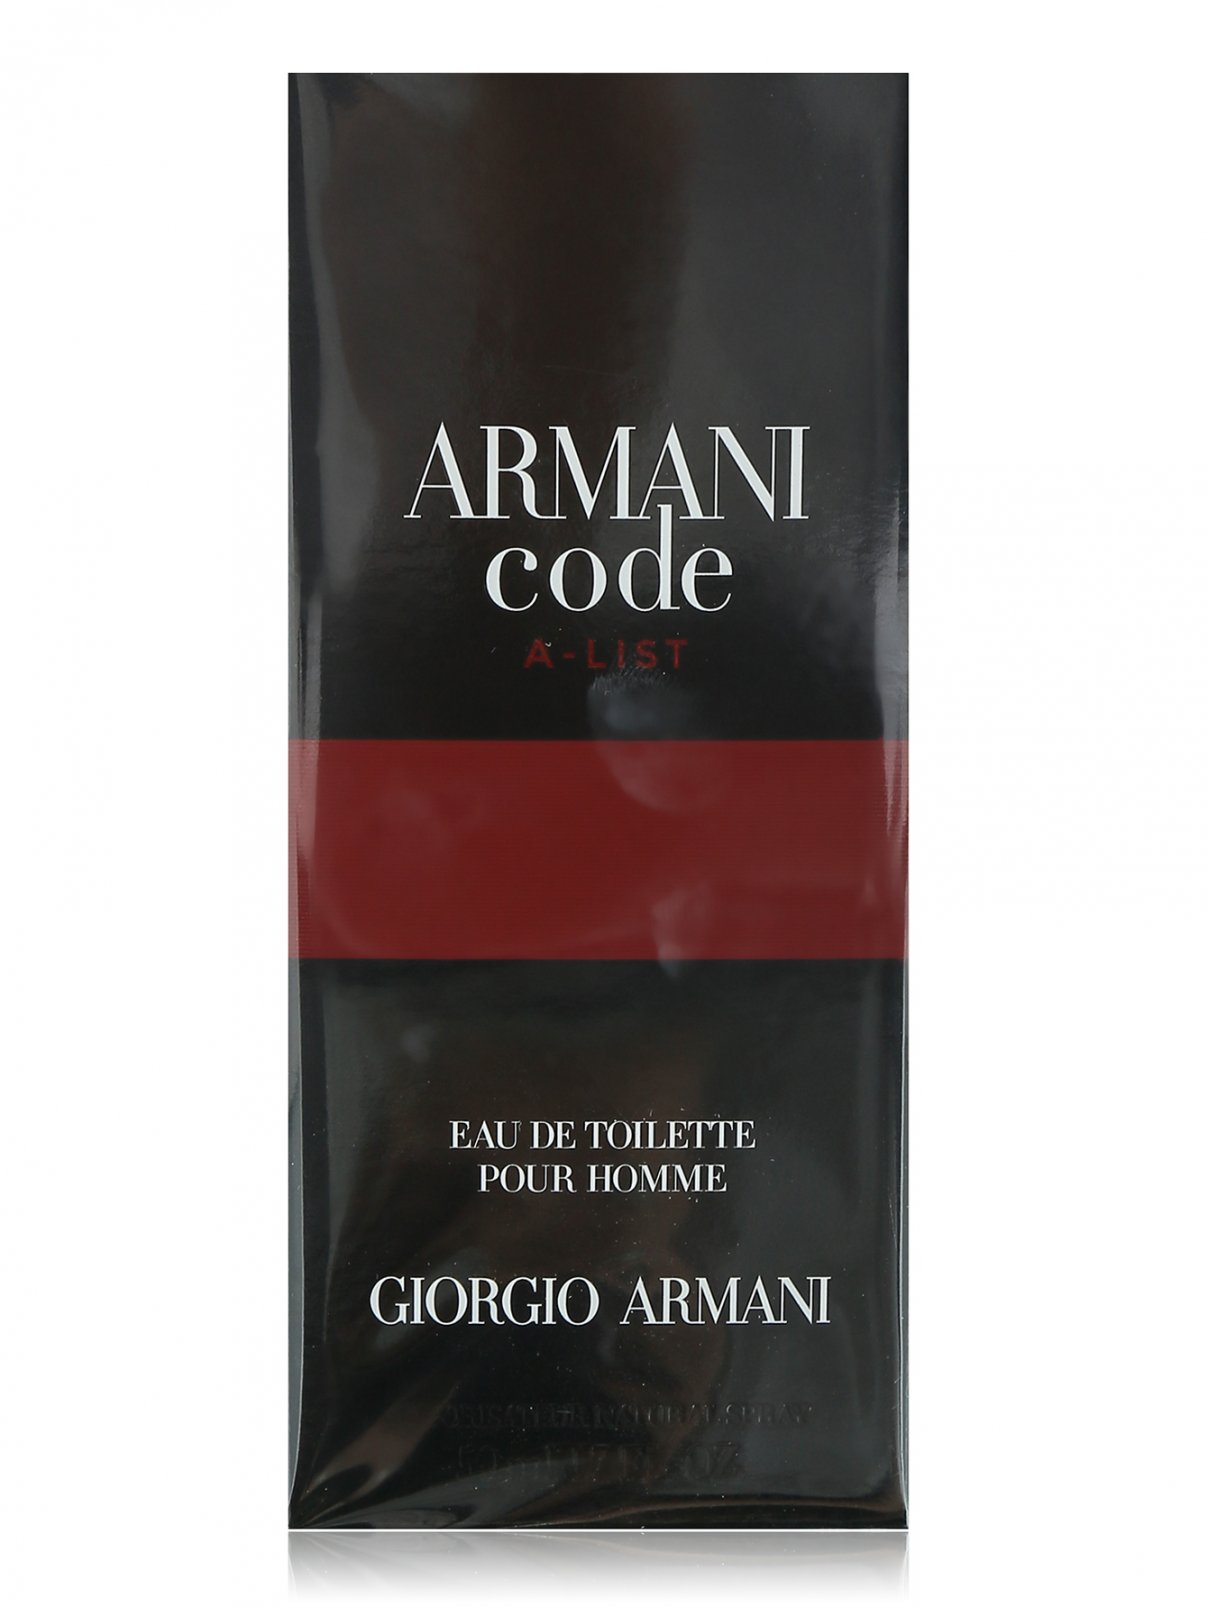 Туалетная вода 50 мл Code A-list Giorgio Armani  –  Общий вид